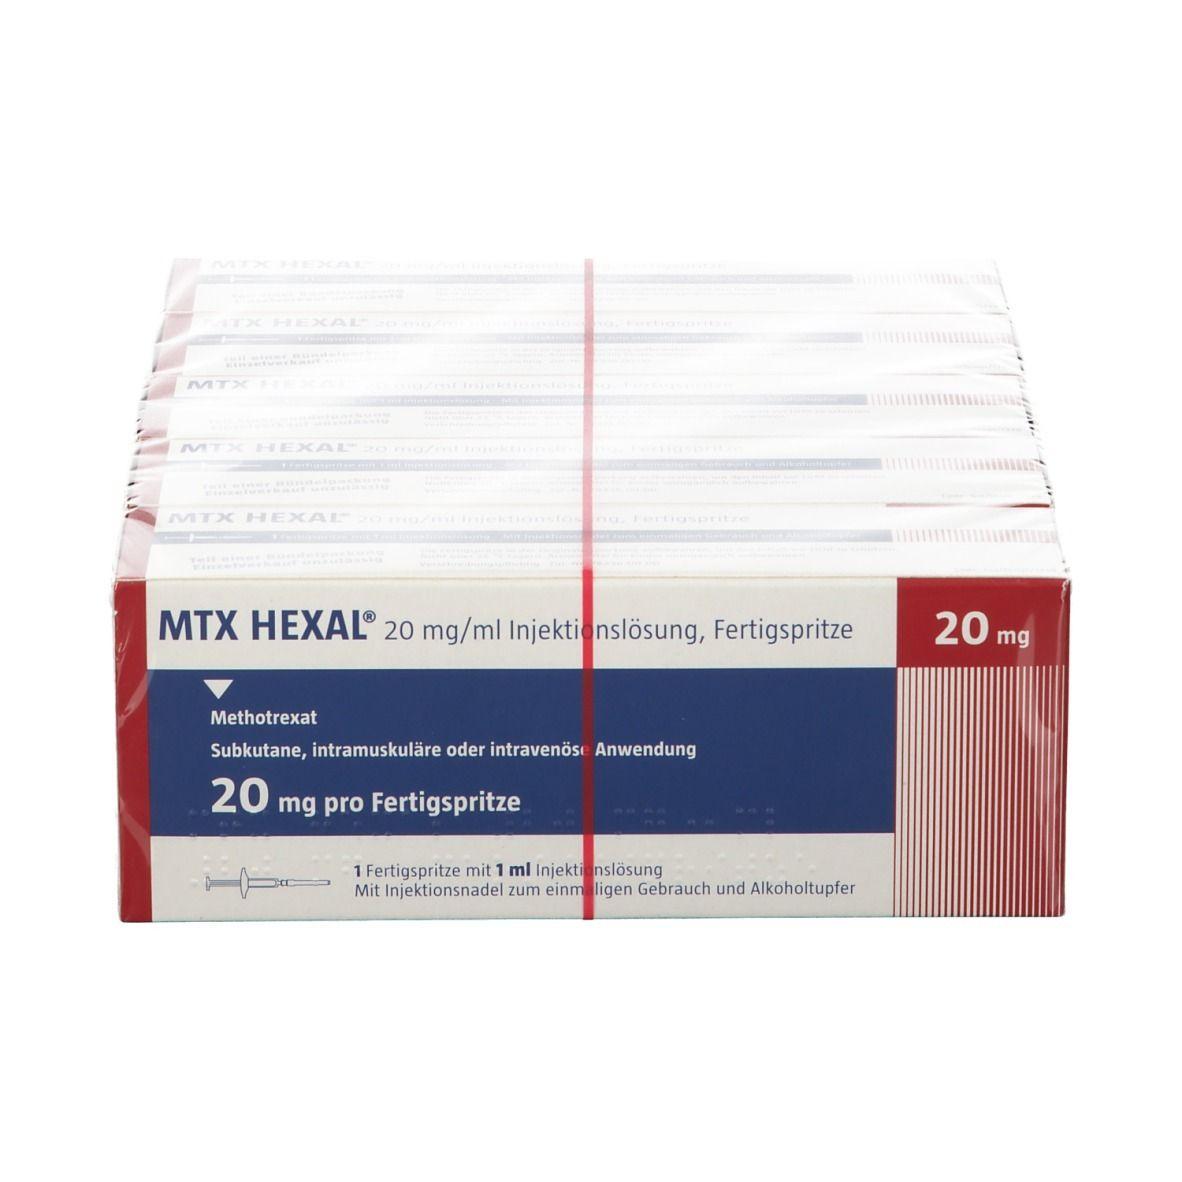 MTX HEXAL® 20 mg/ml Injektionslösung Fertigspritze